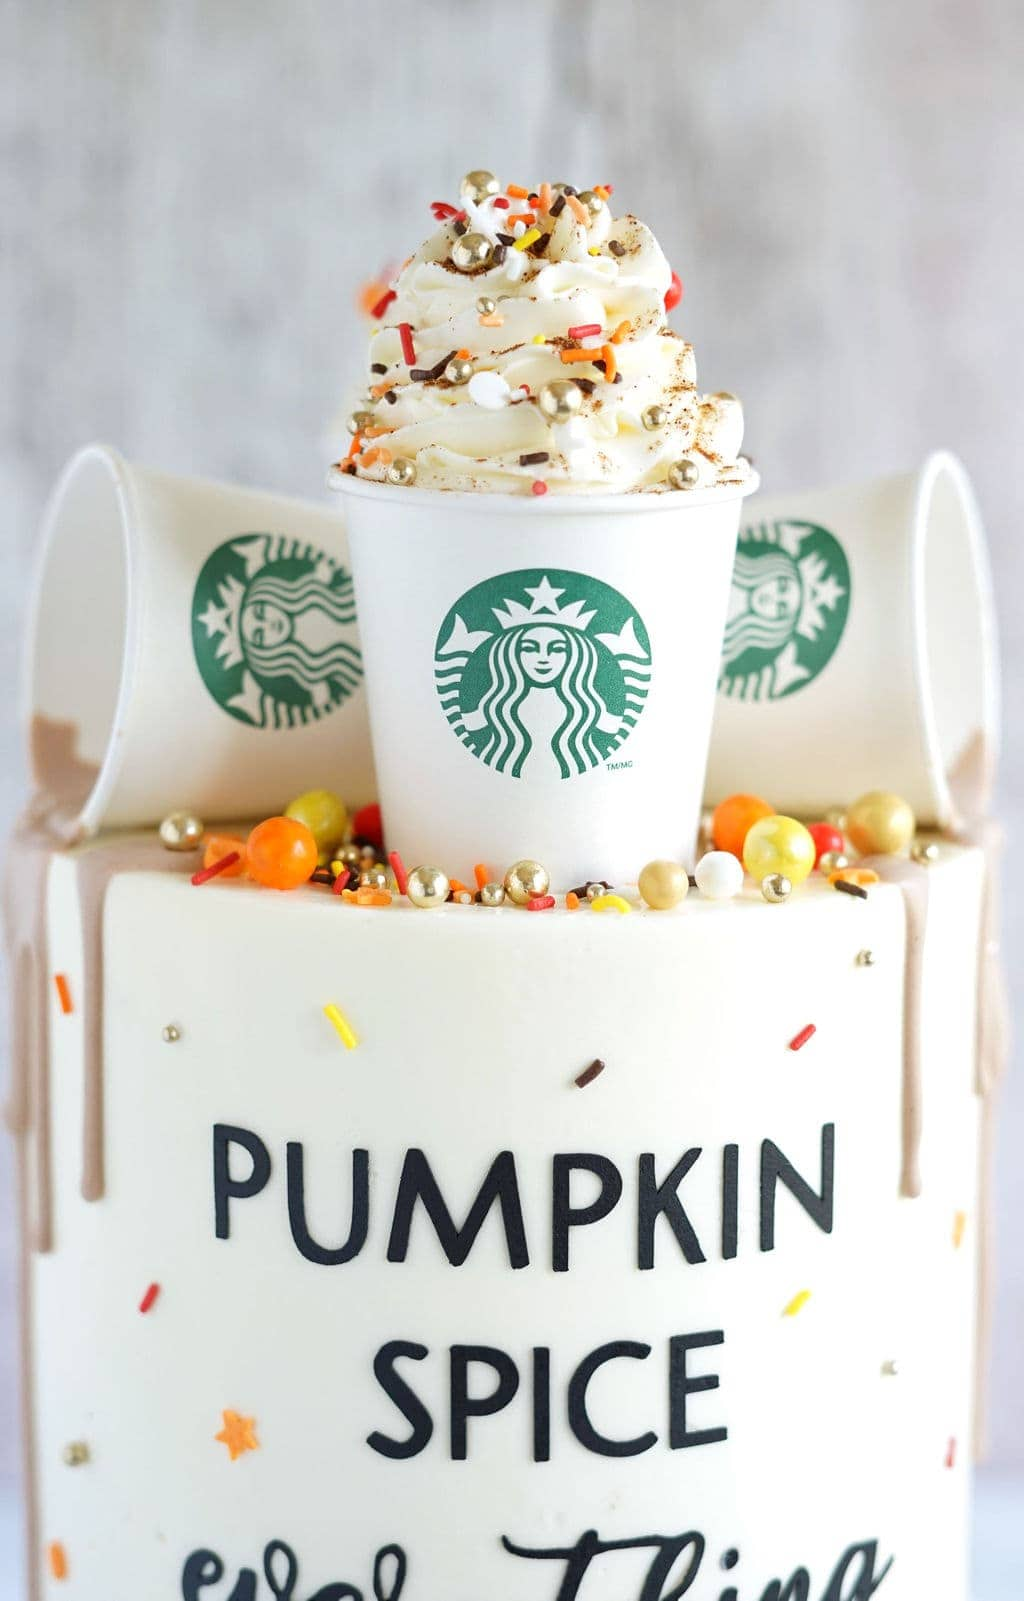 whipped cream on cake